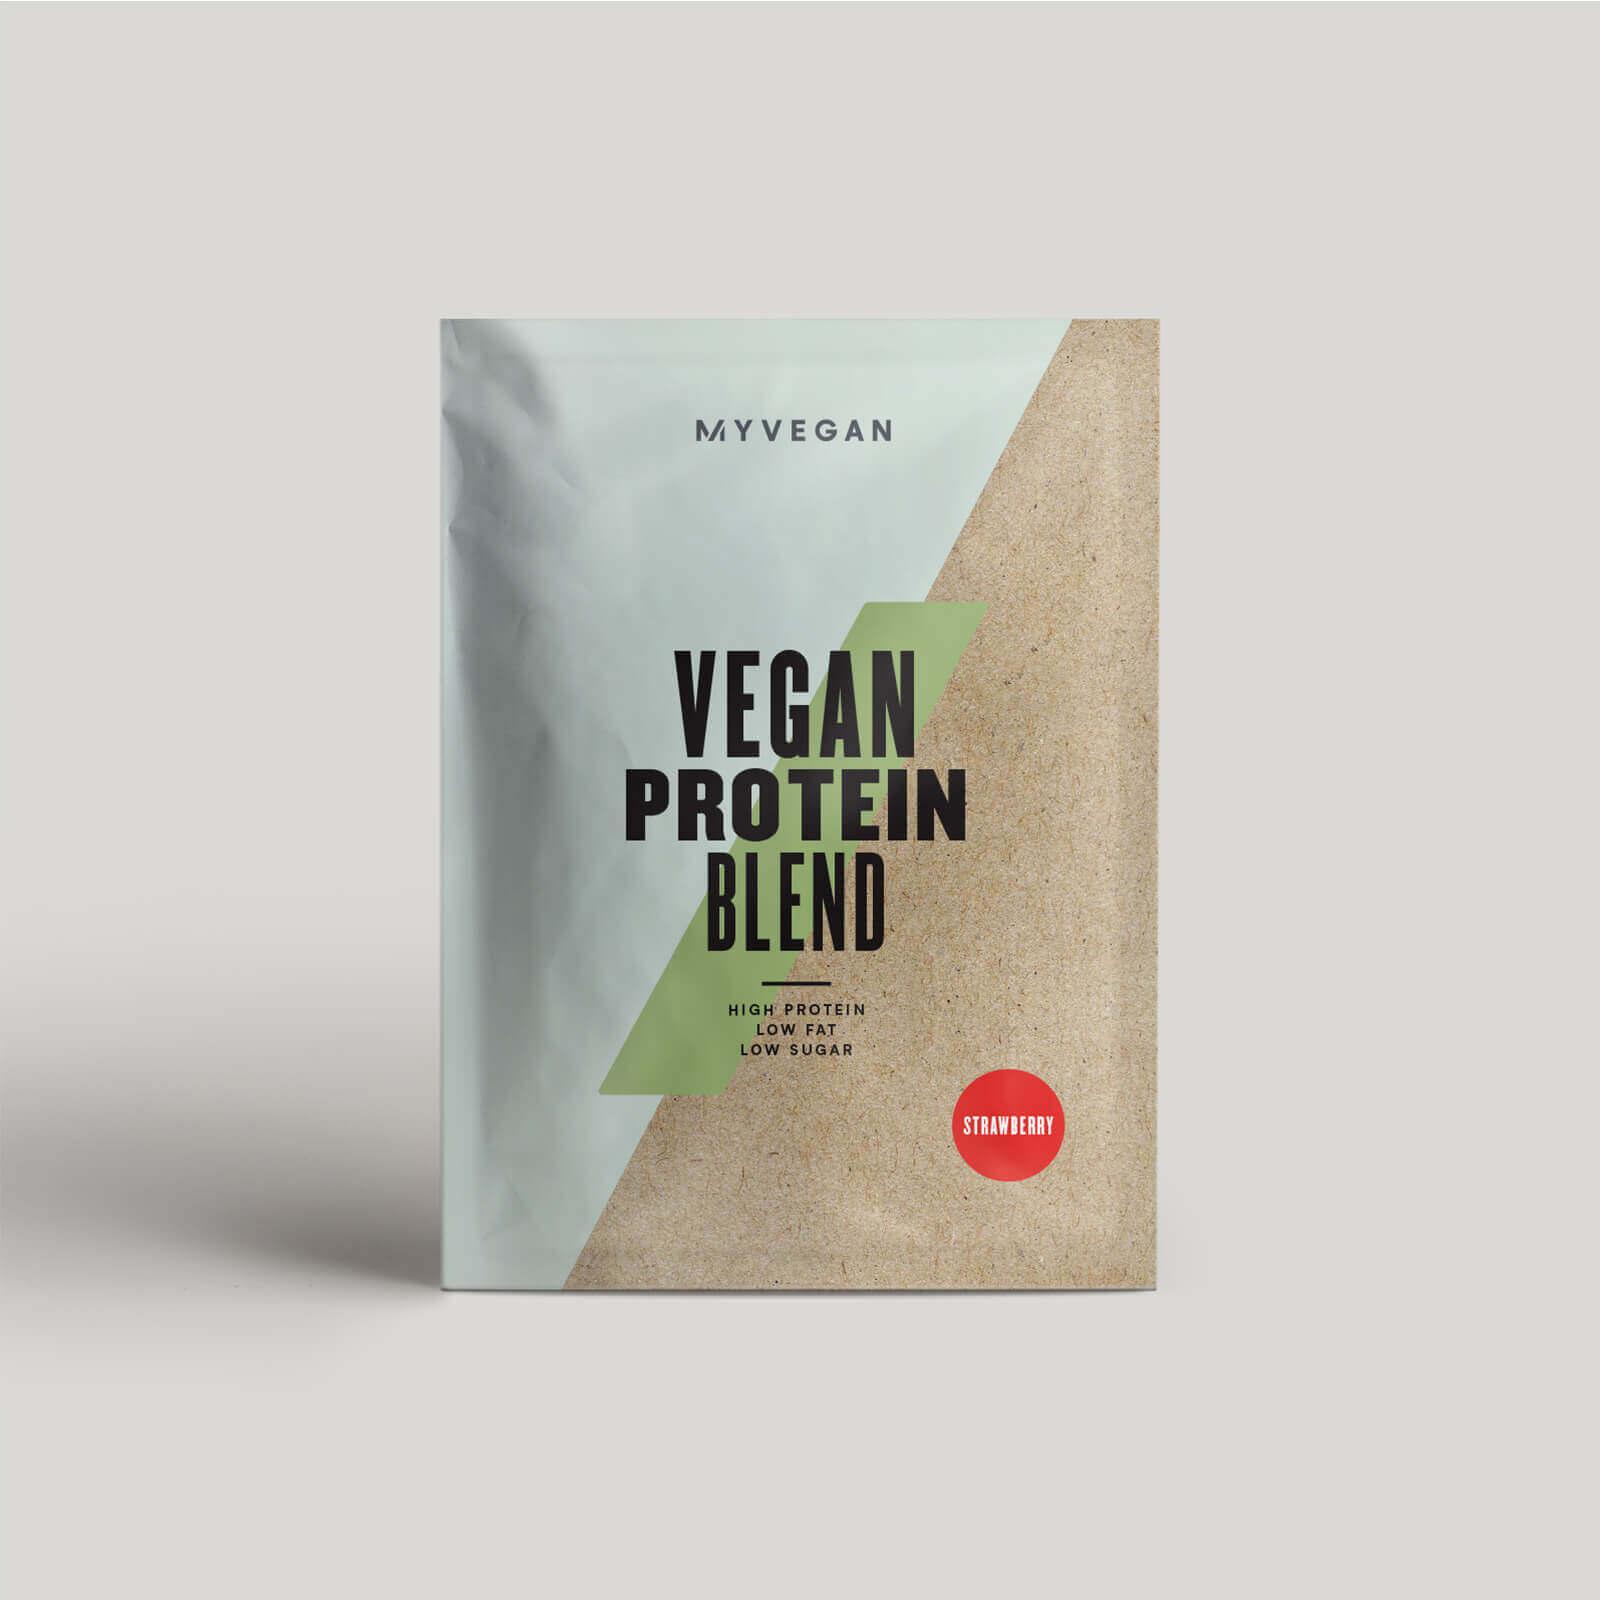 Image of Myvegan Vegan Protein Blend (Sample) - Fragola